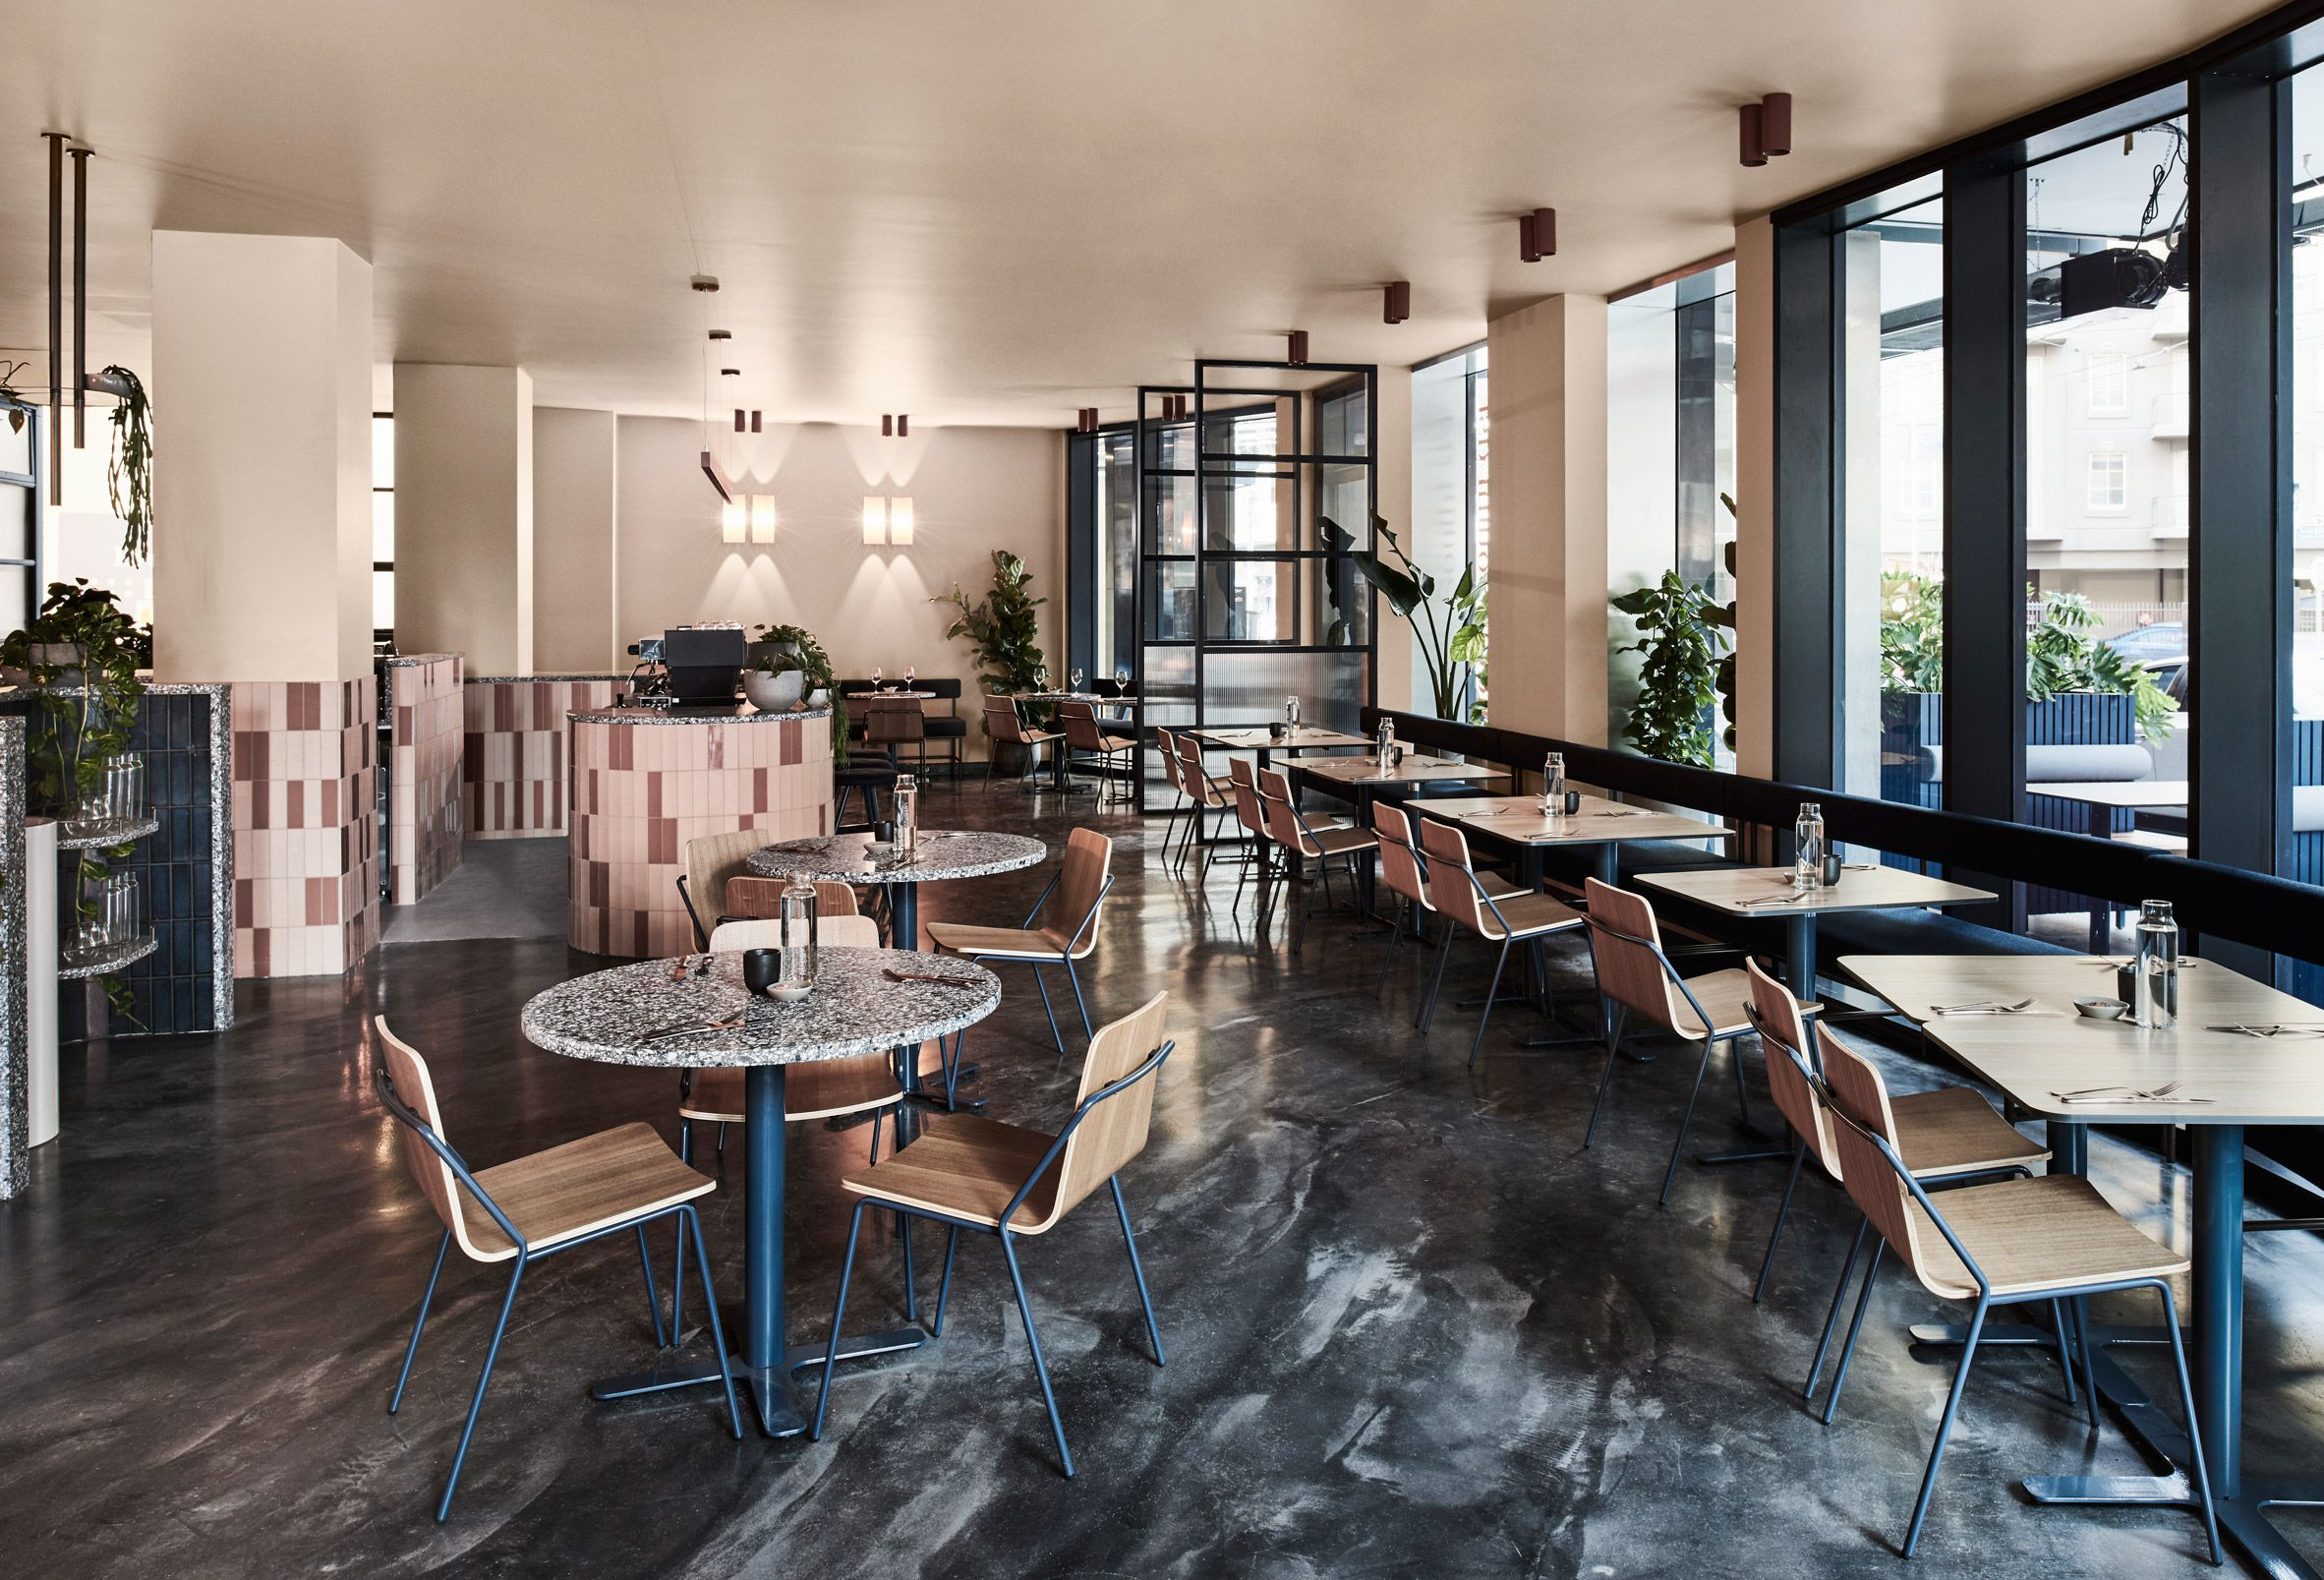 Design Studio Biasol Designs Middle Eastern Inspired Melbourne Restaurant Restaurant Design Inspiration Restaurant Interior Design Restaurant Decor